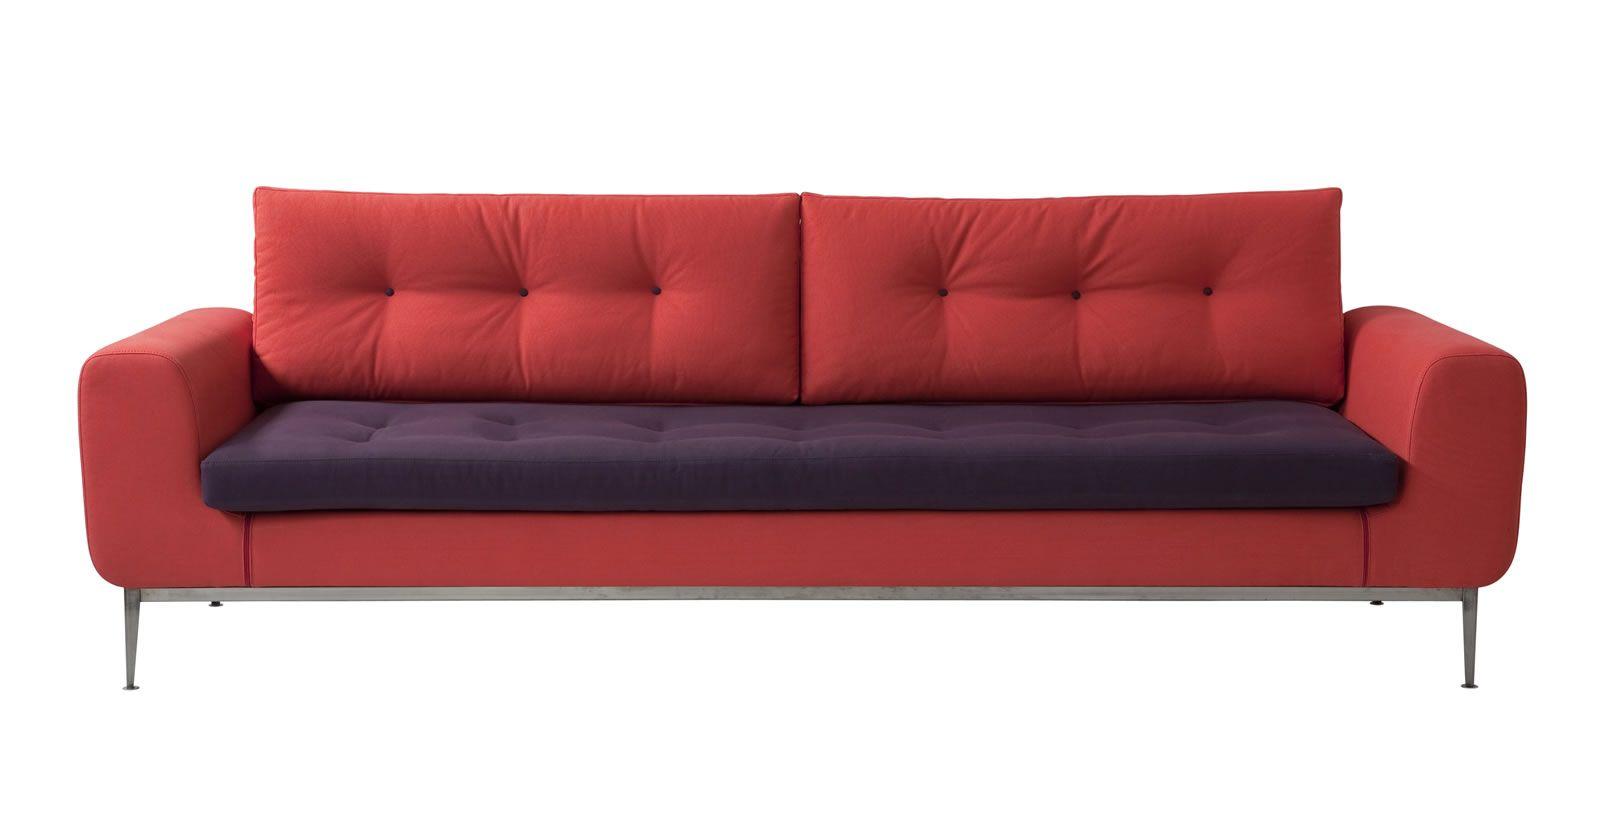 sofá verso / fernando jaeger atelier | design: furniture | pinterest